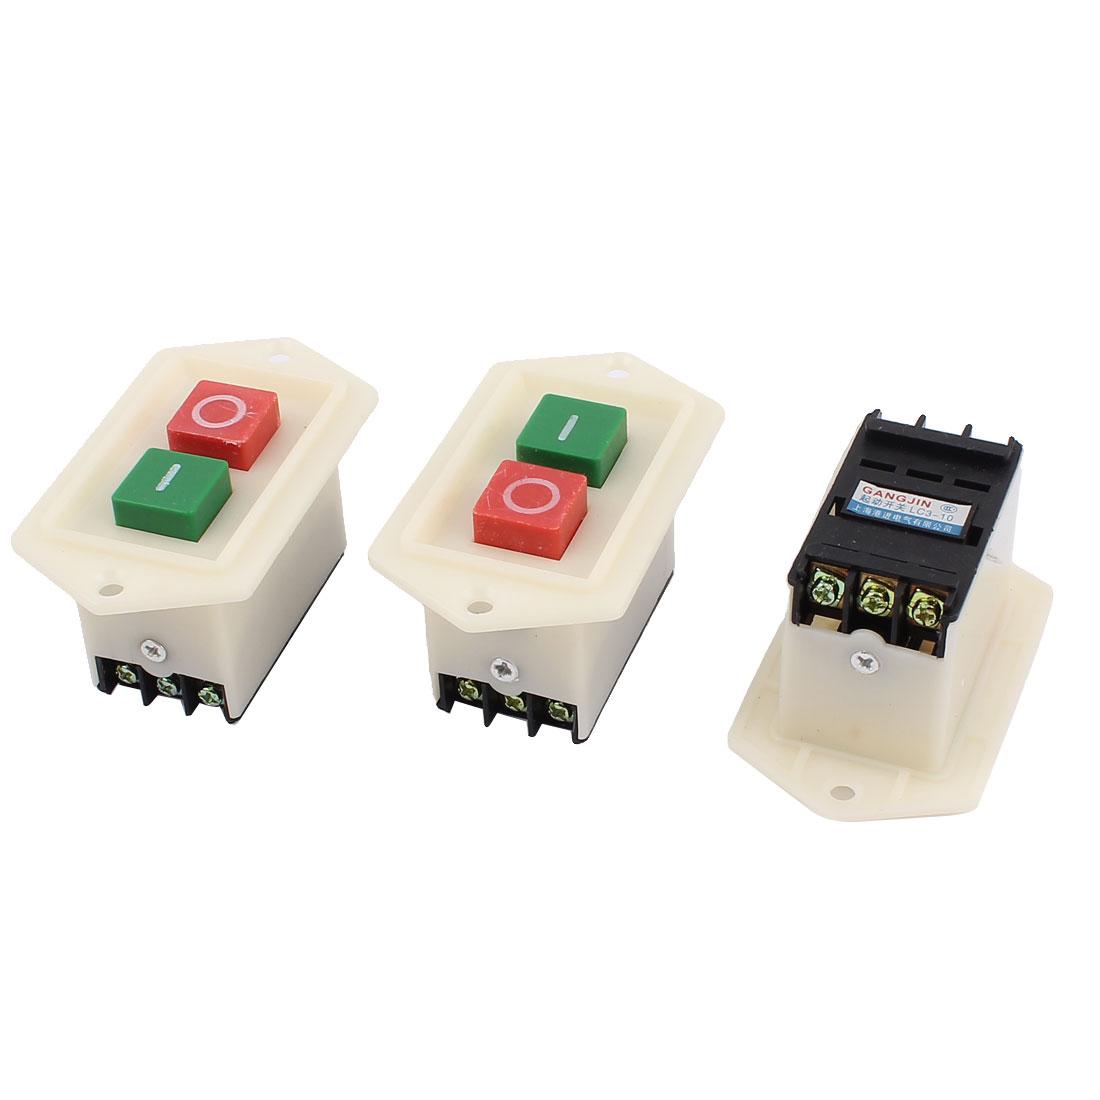 AC 220/380V 10A O/I Start Stop Self-Locking Push Button Switch 3pcs